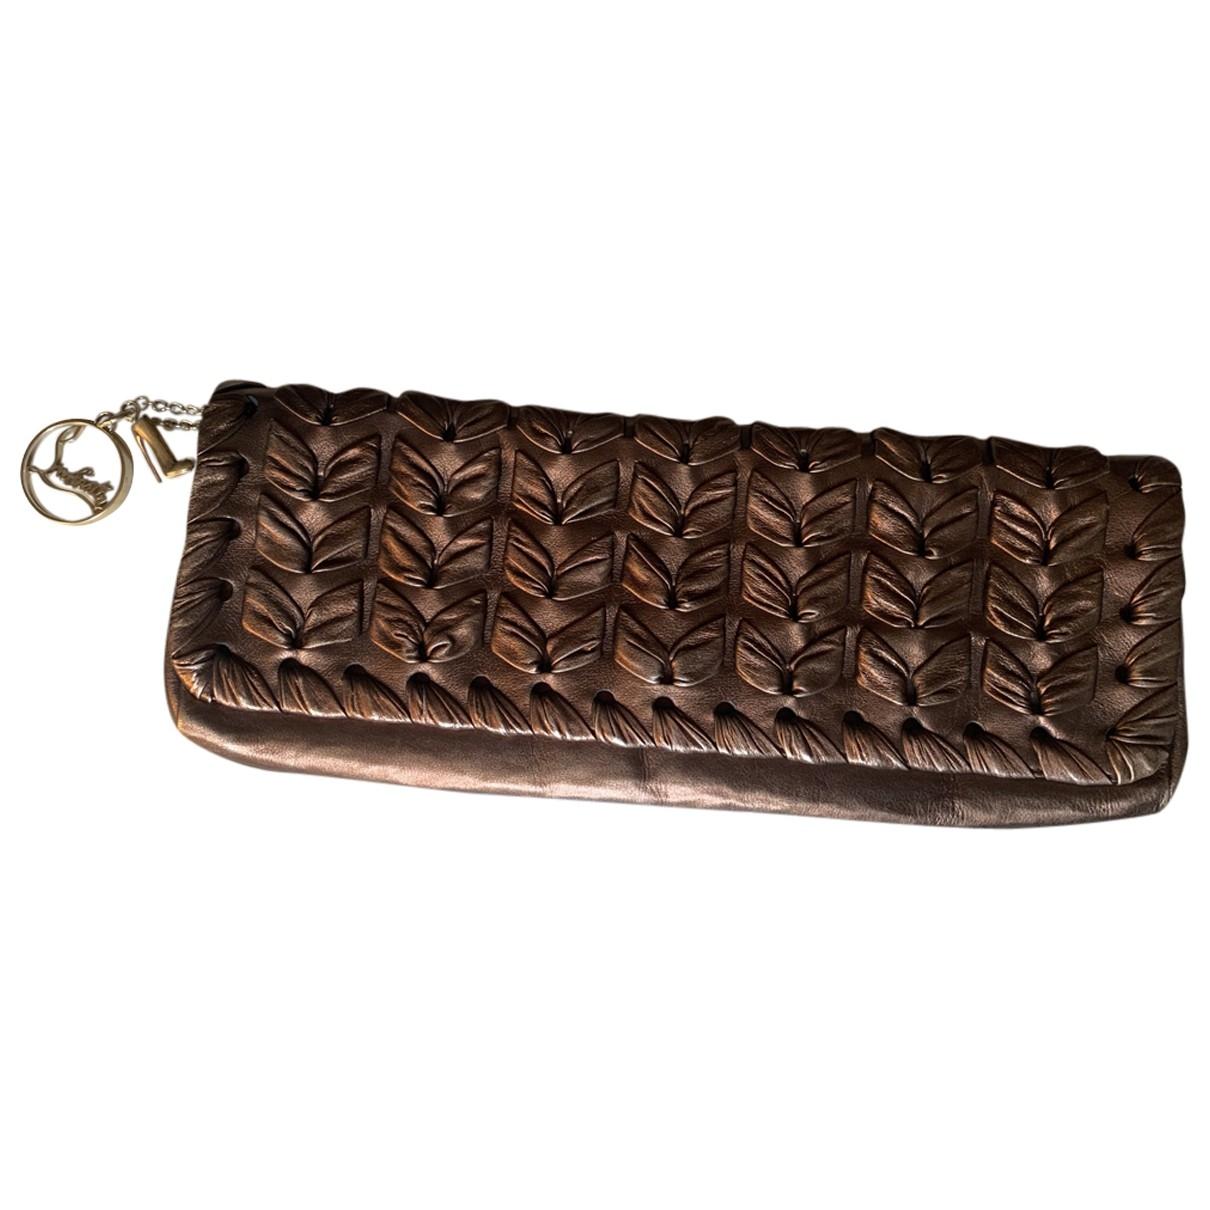 Christian Louboutin \N Metallic Leather Clutch bag for Women \N